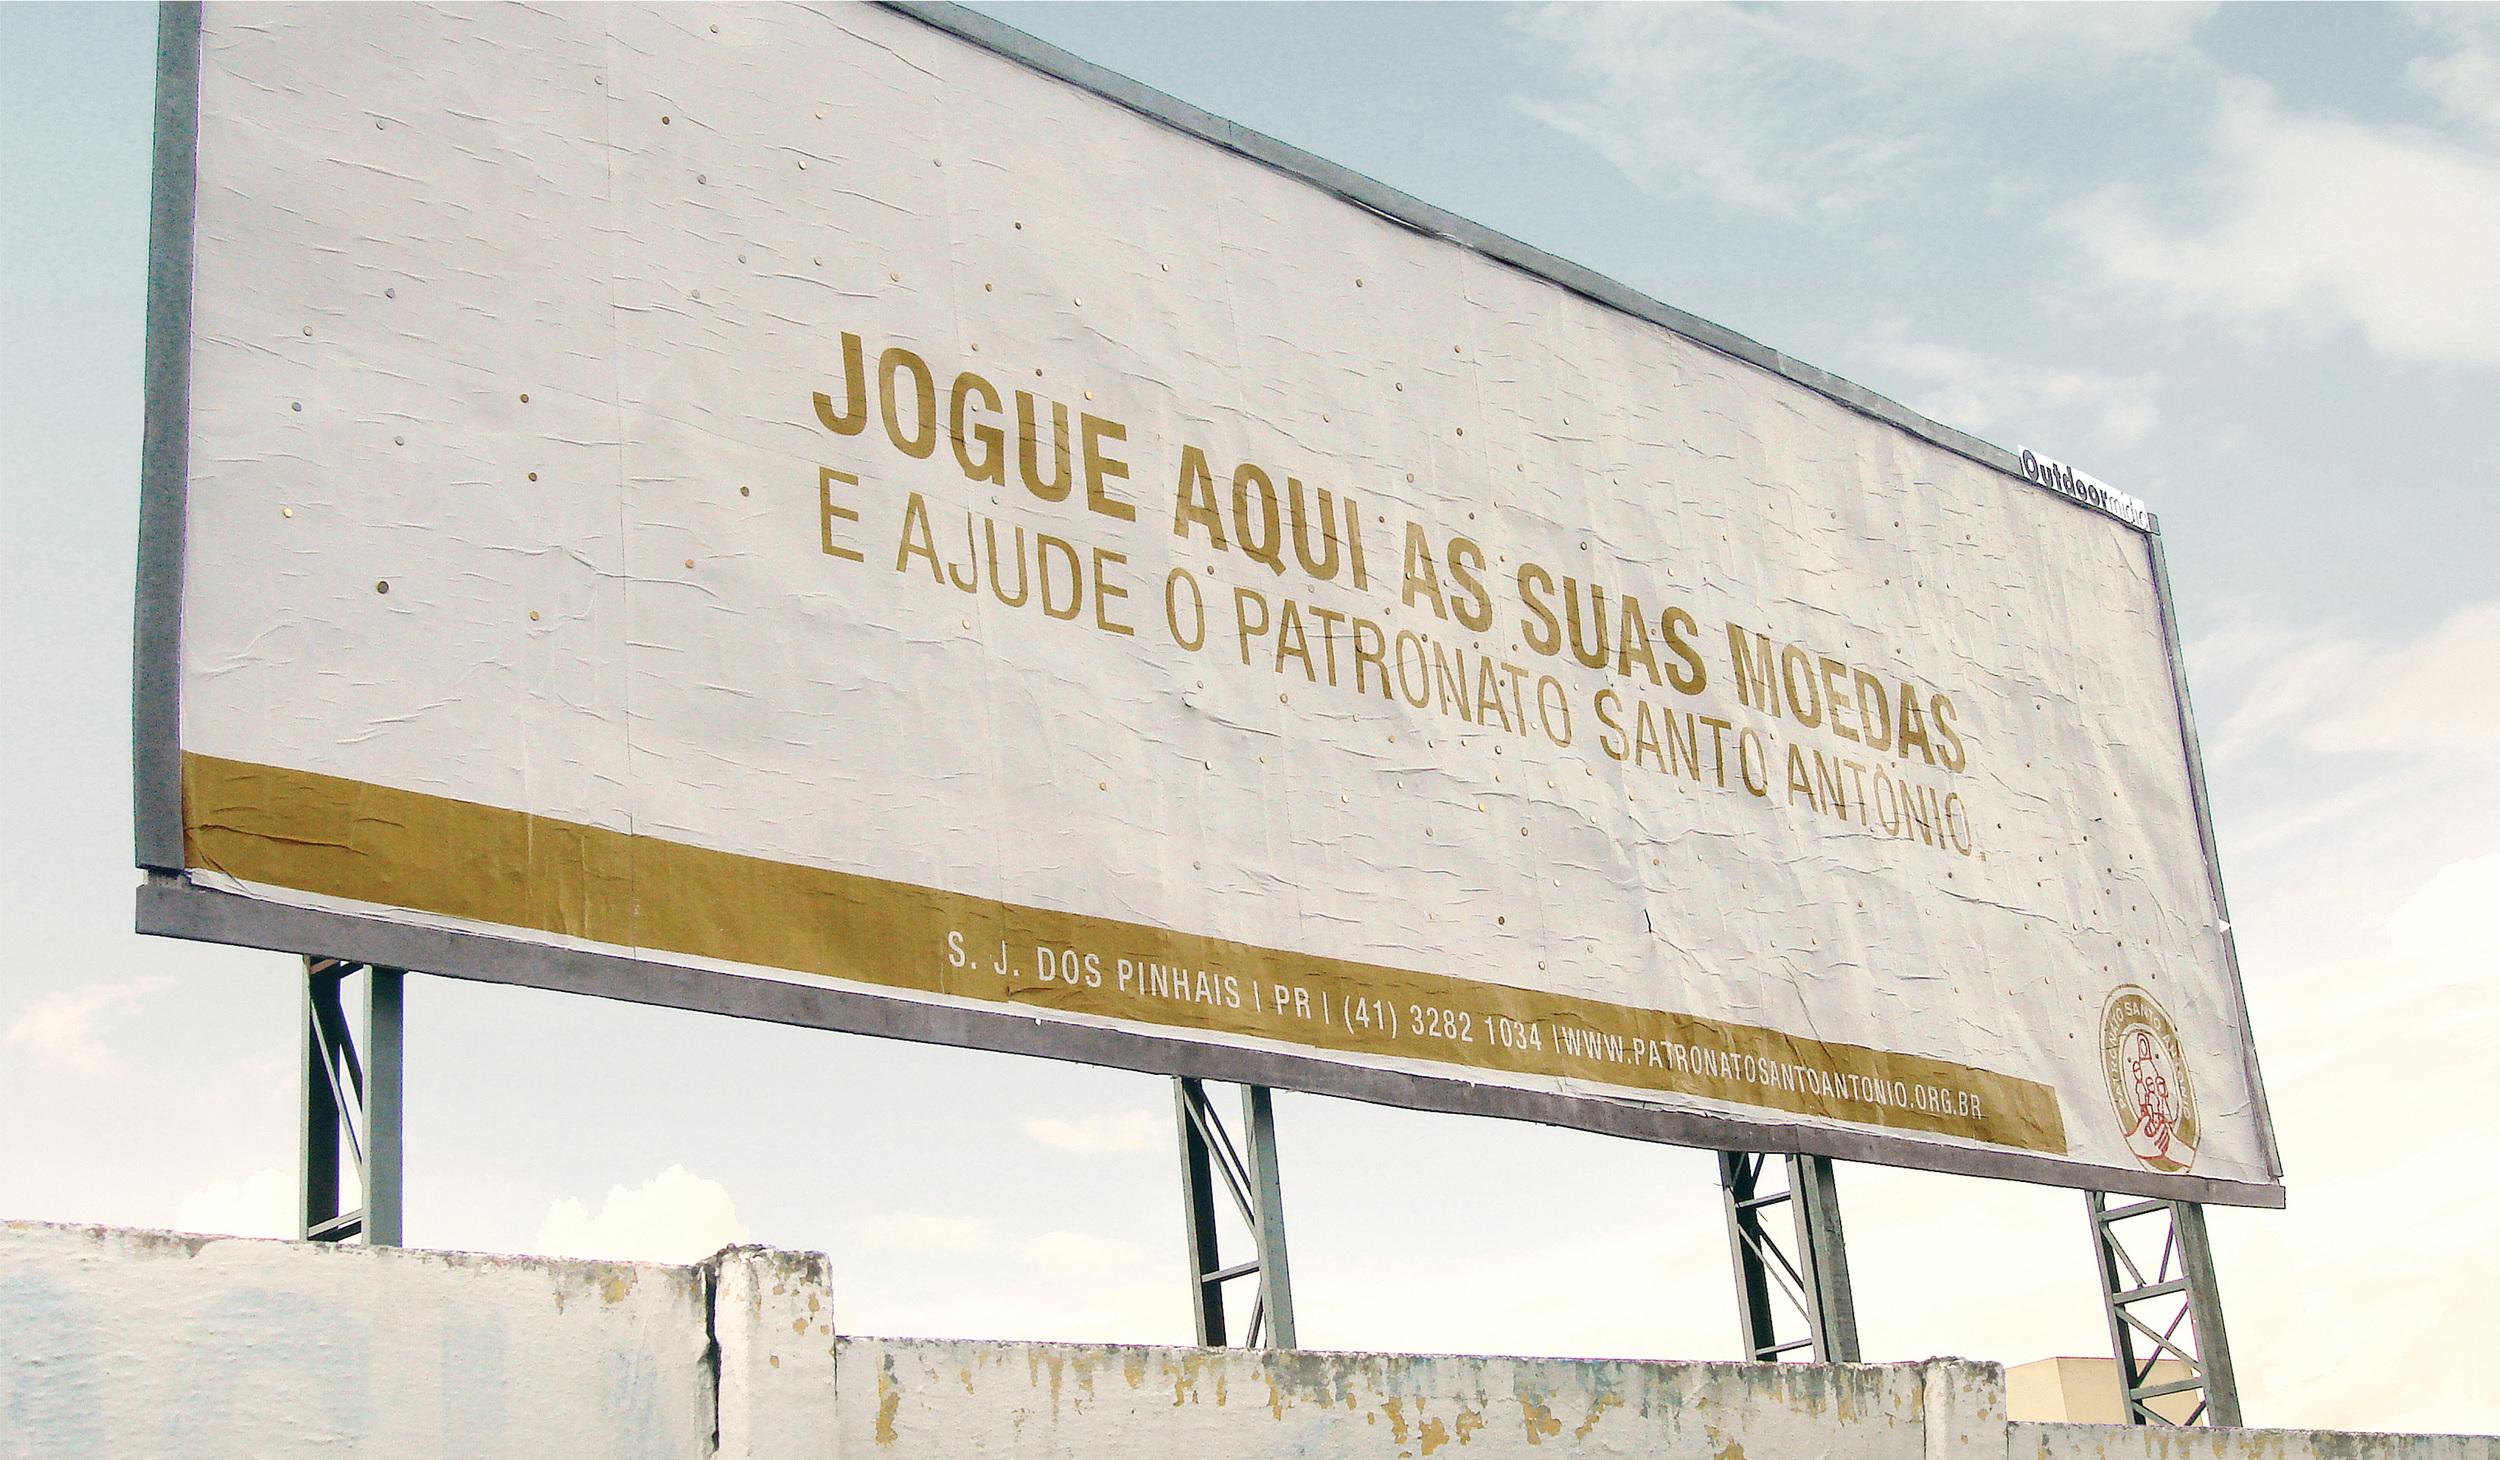 Throw your coins here and help Patronato Santo Antônio.